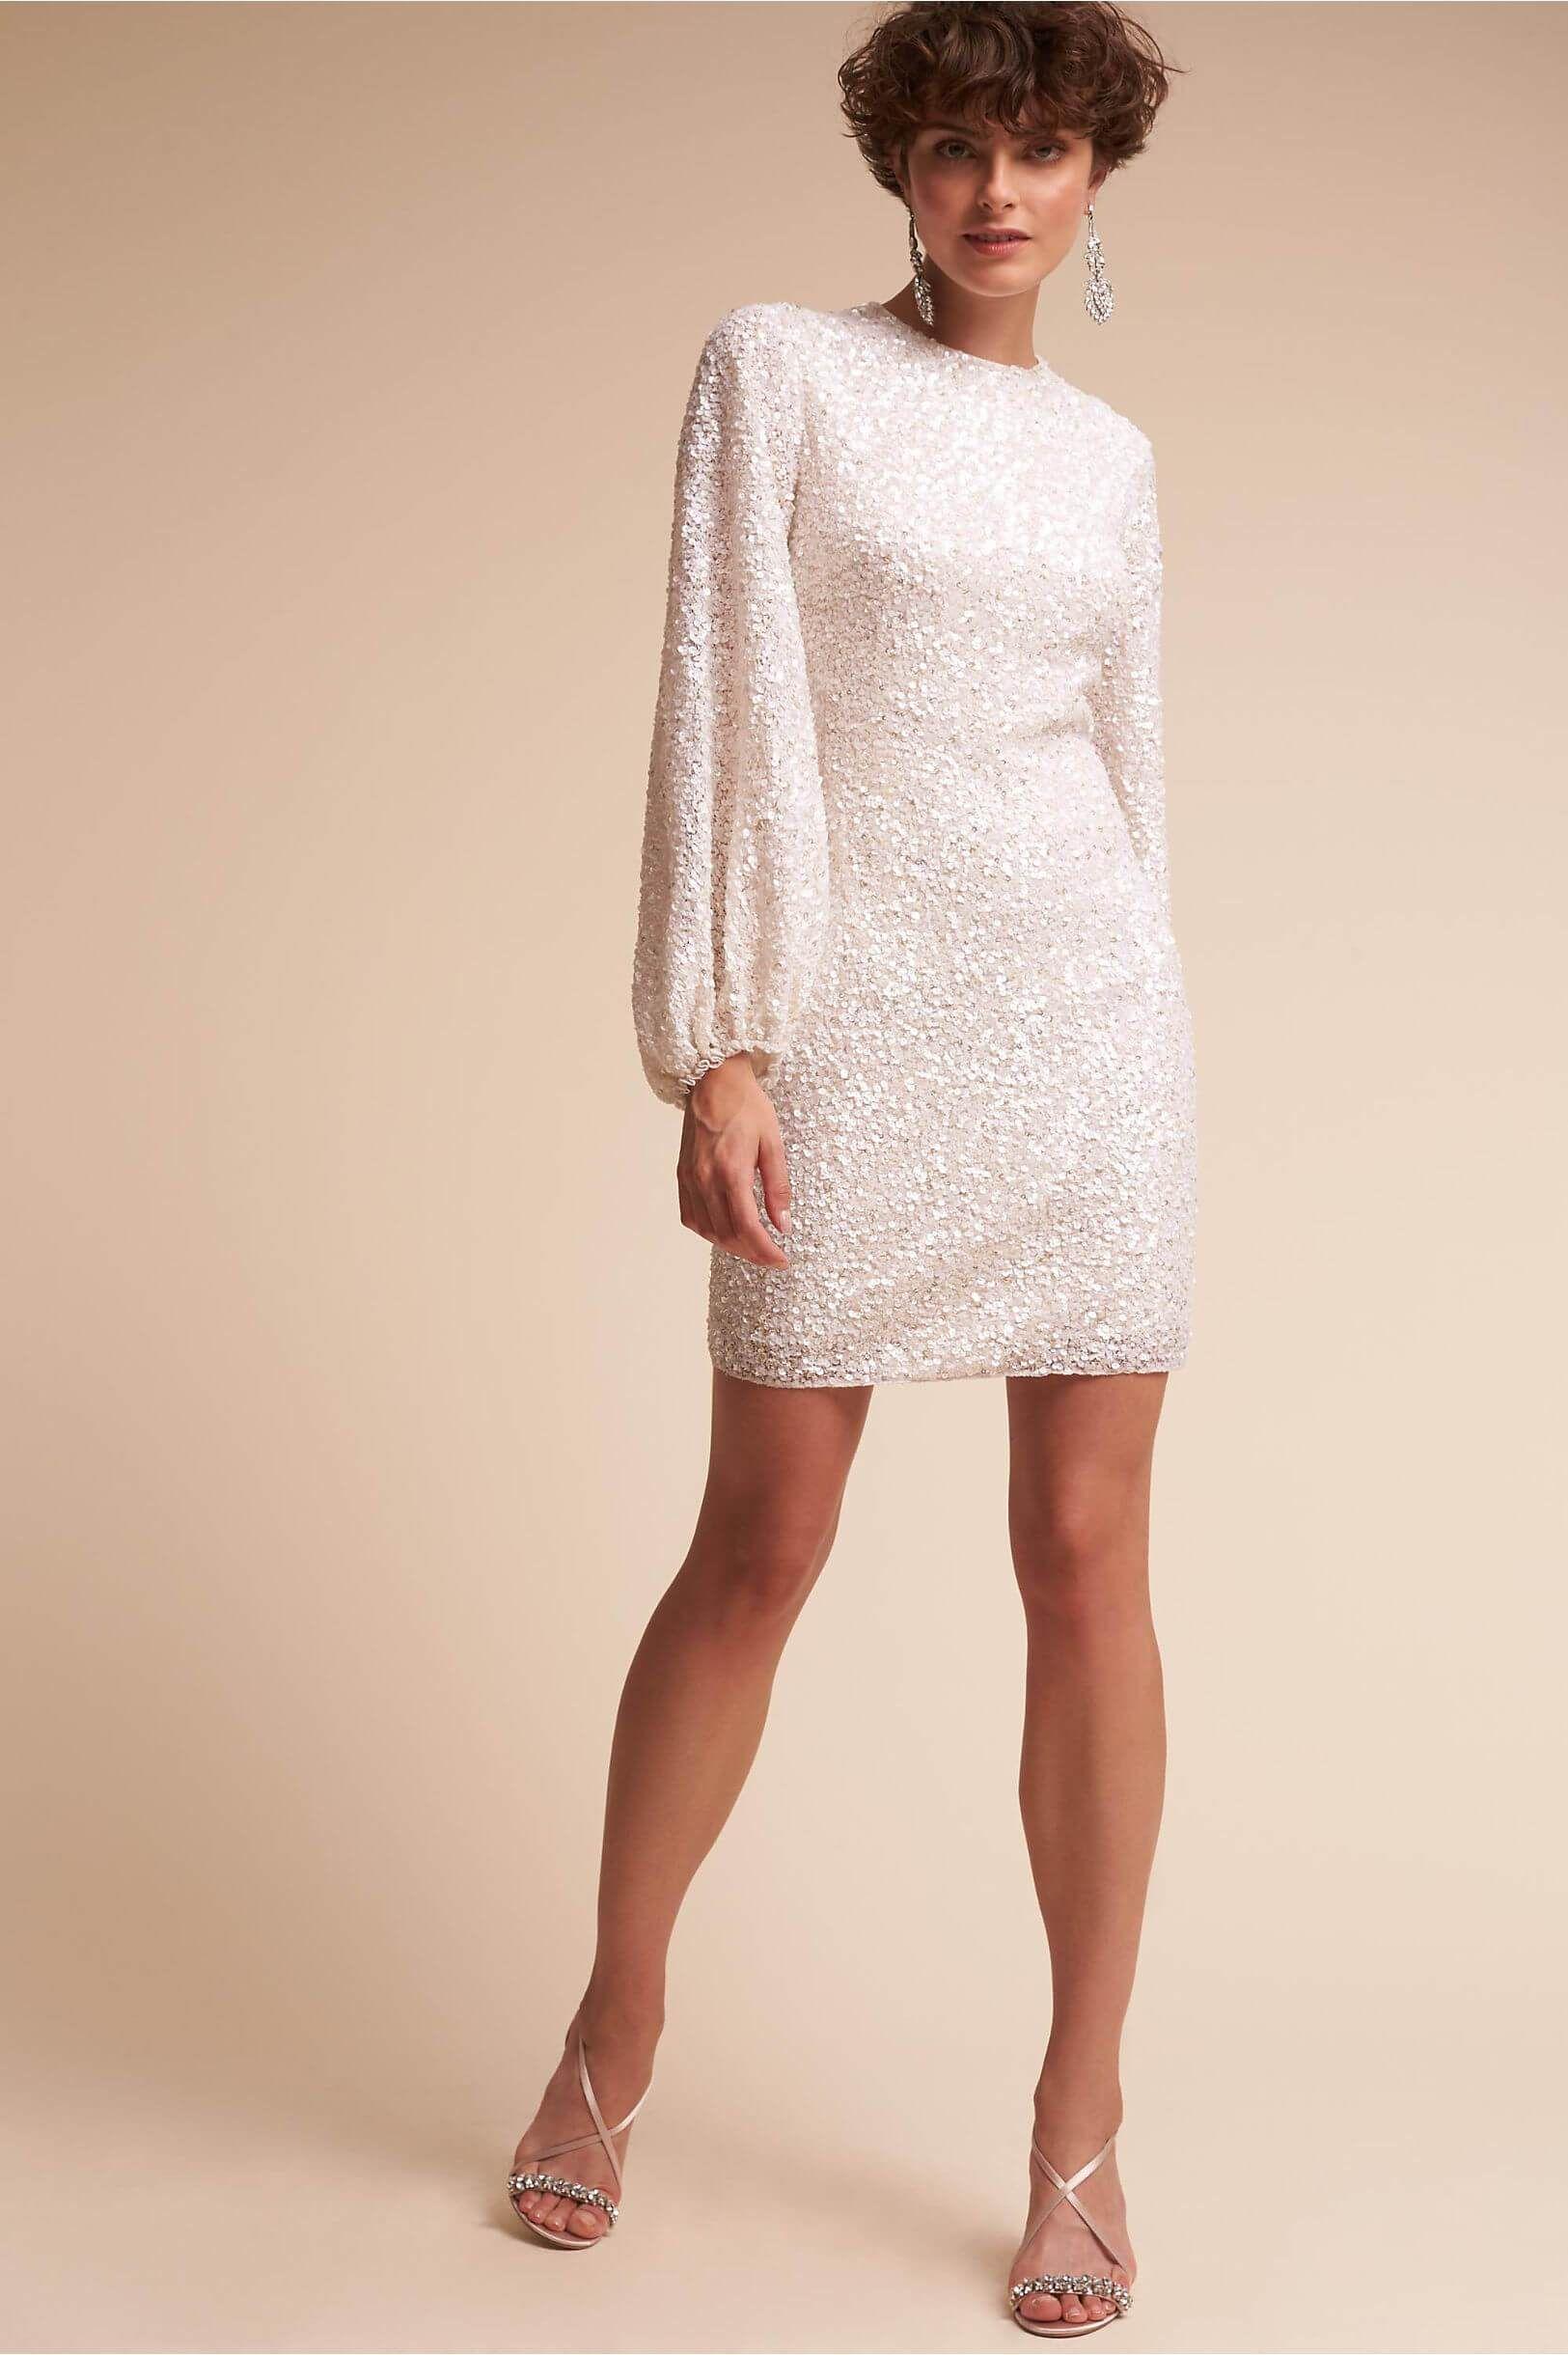 Ivory Goldie Dress Dress Of The Week 35 Knotsvilla Wedding Ideas Canada Wedding Blog Little White Dresses Short Wedding Dress White Dresses For Women